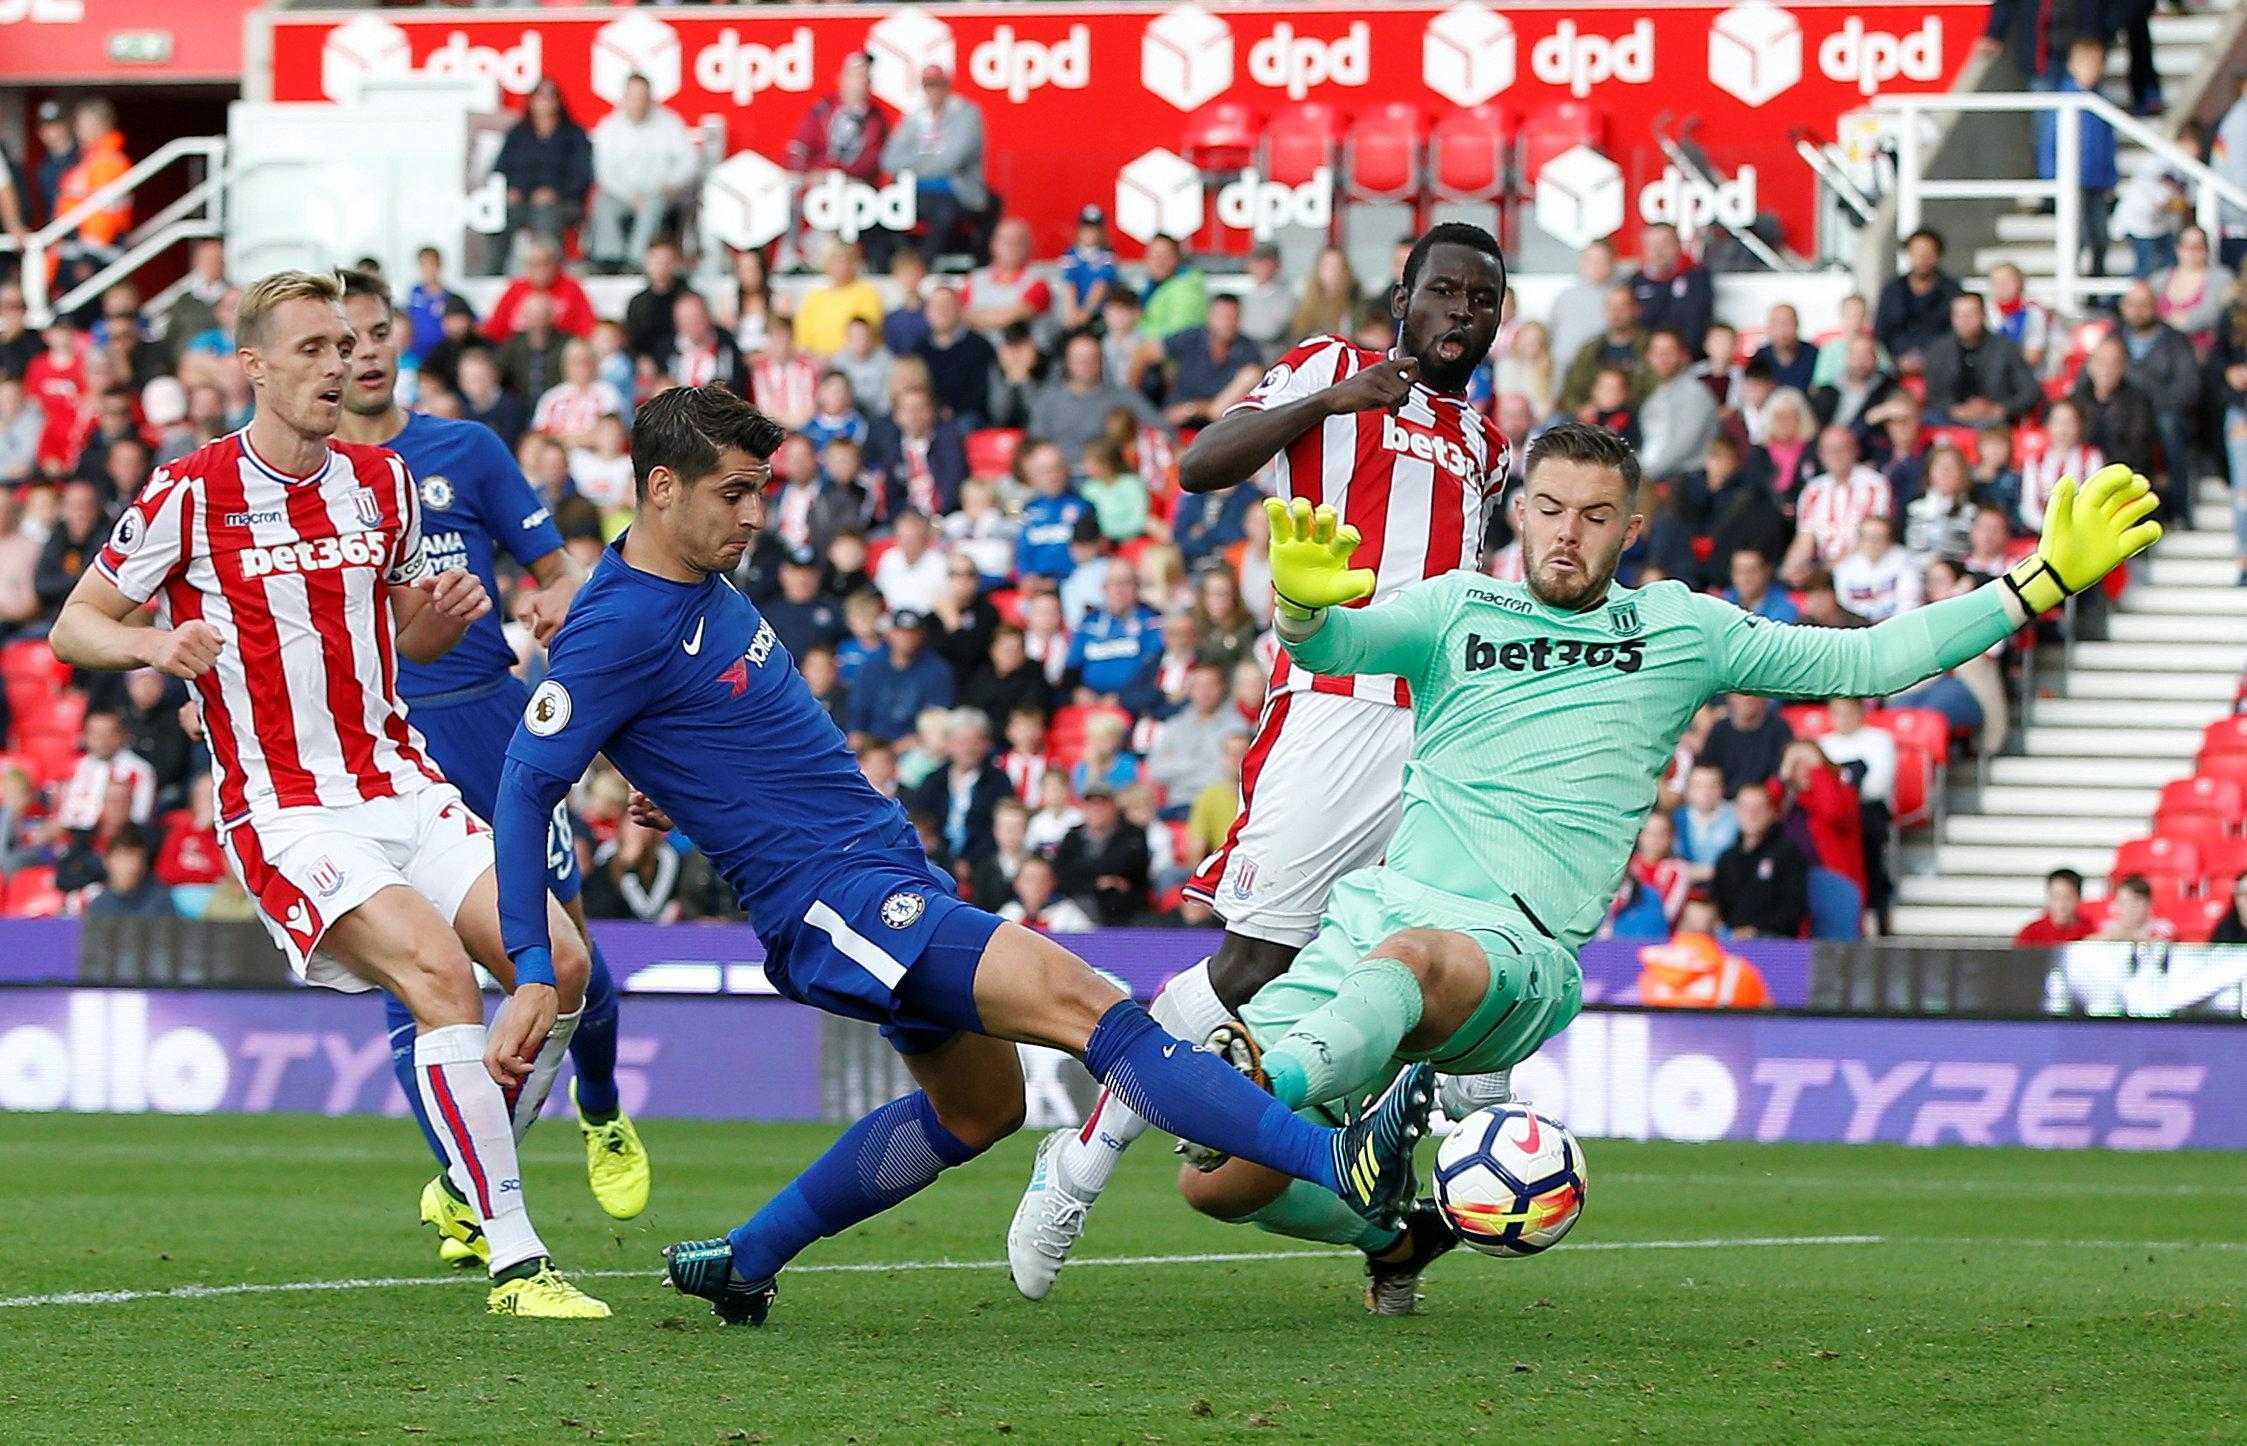 Alvaro Morata has hit the ground running at Chelsea